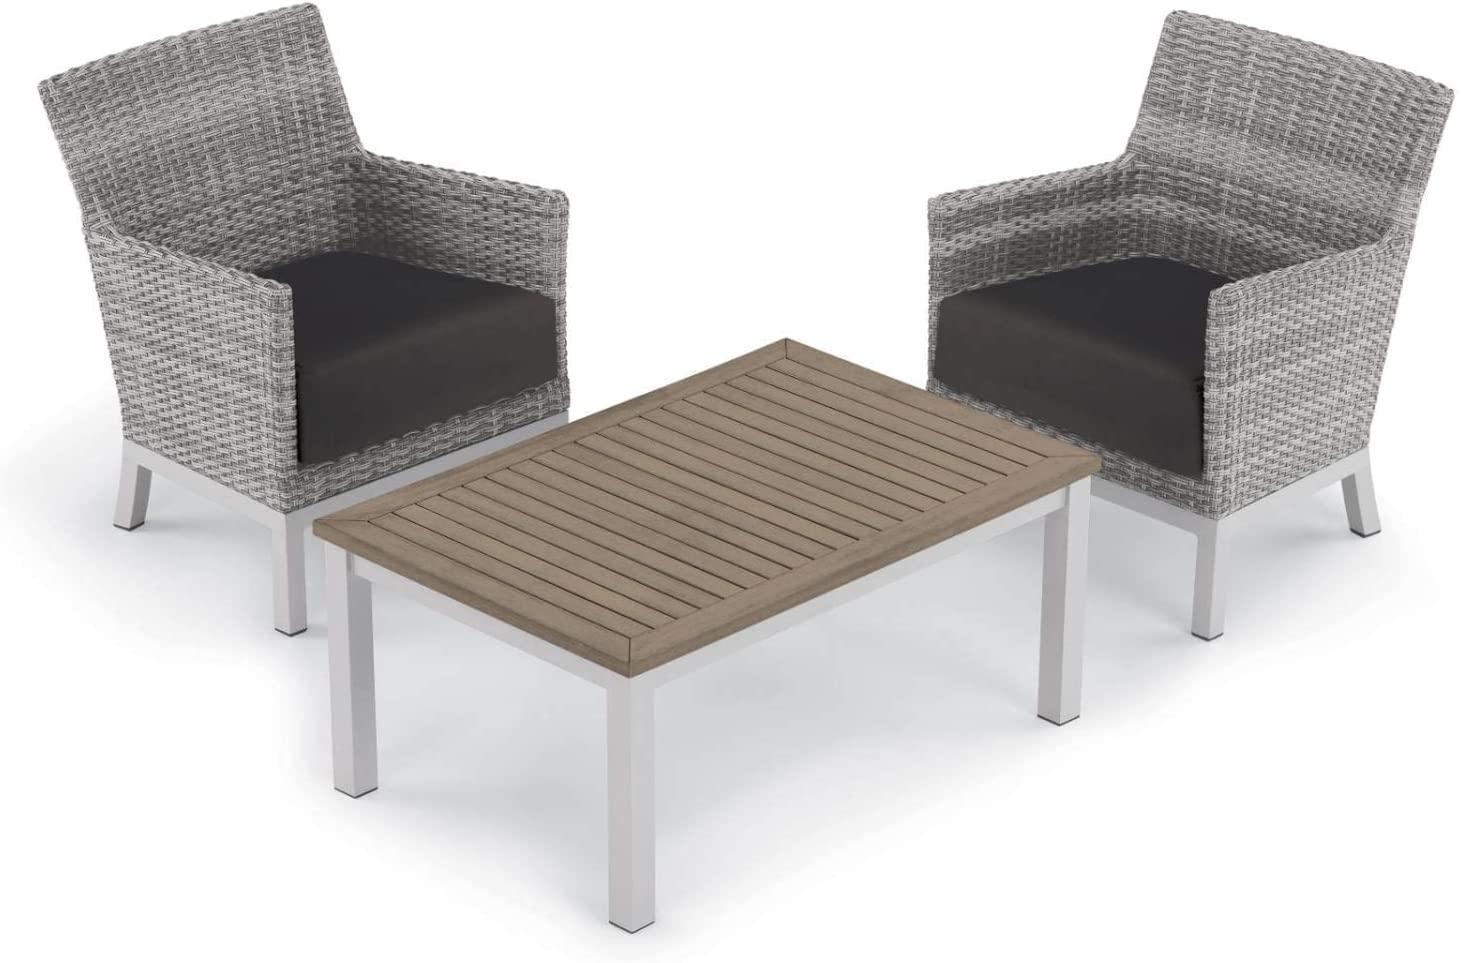 Oxford Garden 5570 Argento & Travira Furniture Set, Powder Coat Flint